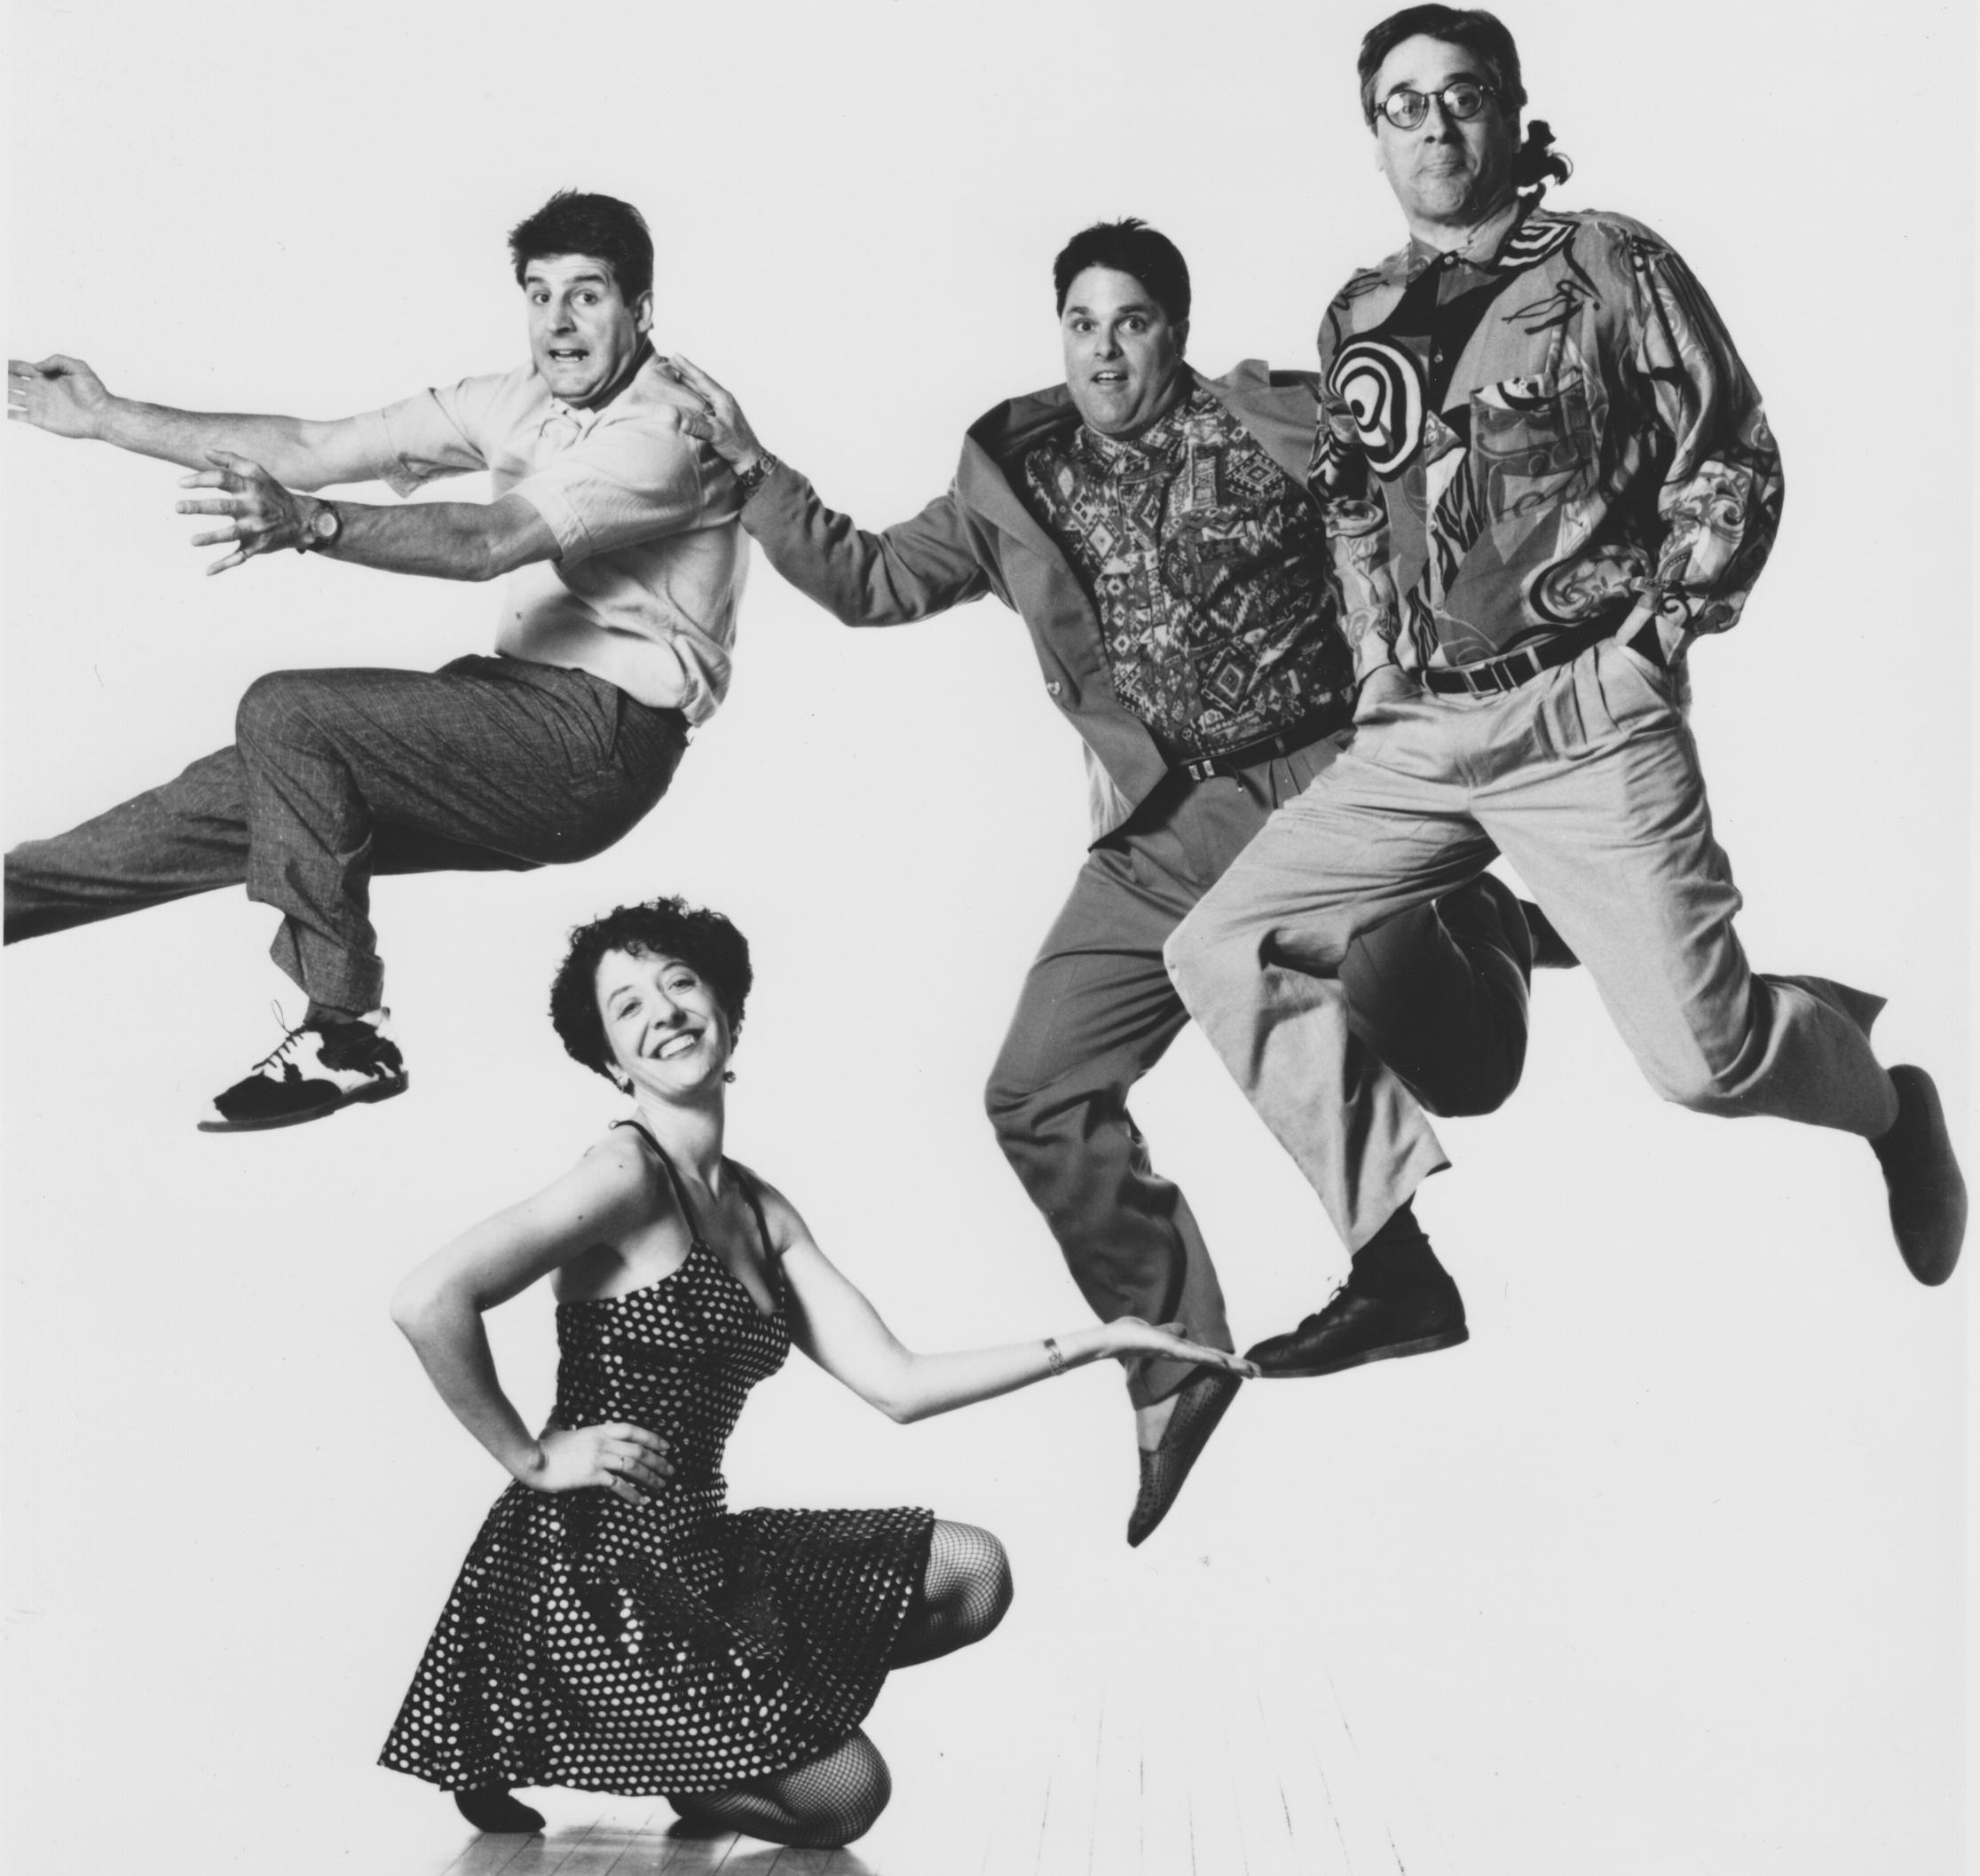 Joe, Janie, Matthew, Richard - 1991 - 96. photo: Lois Greenfield